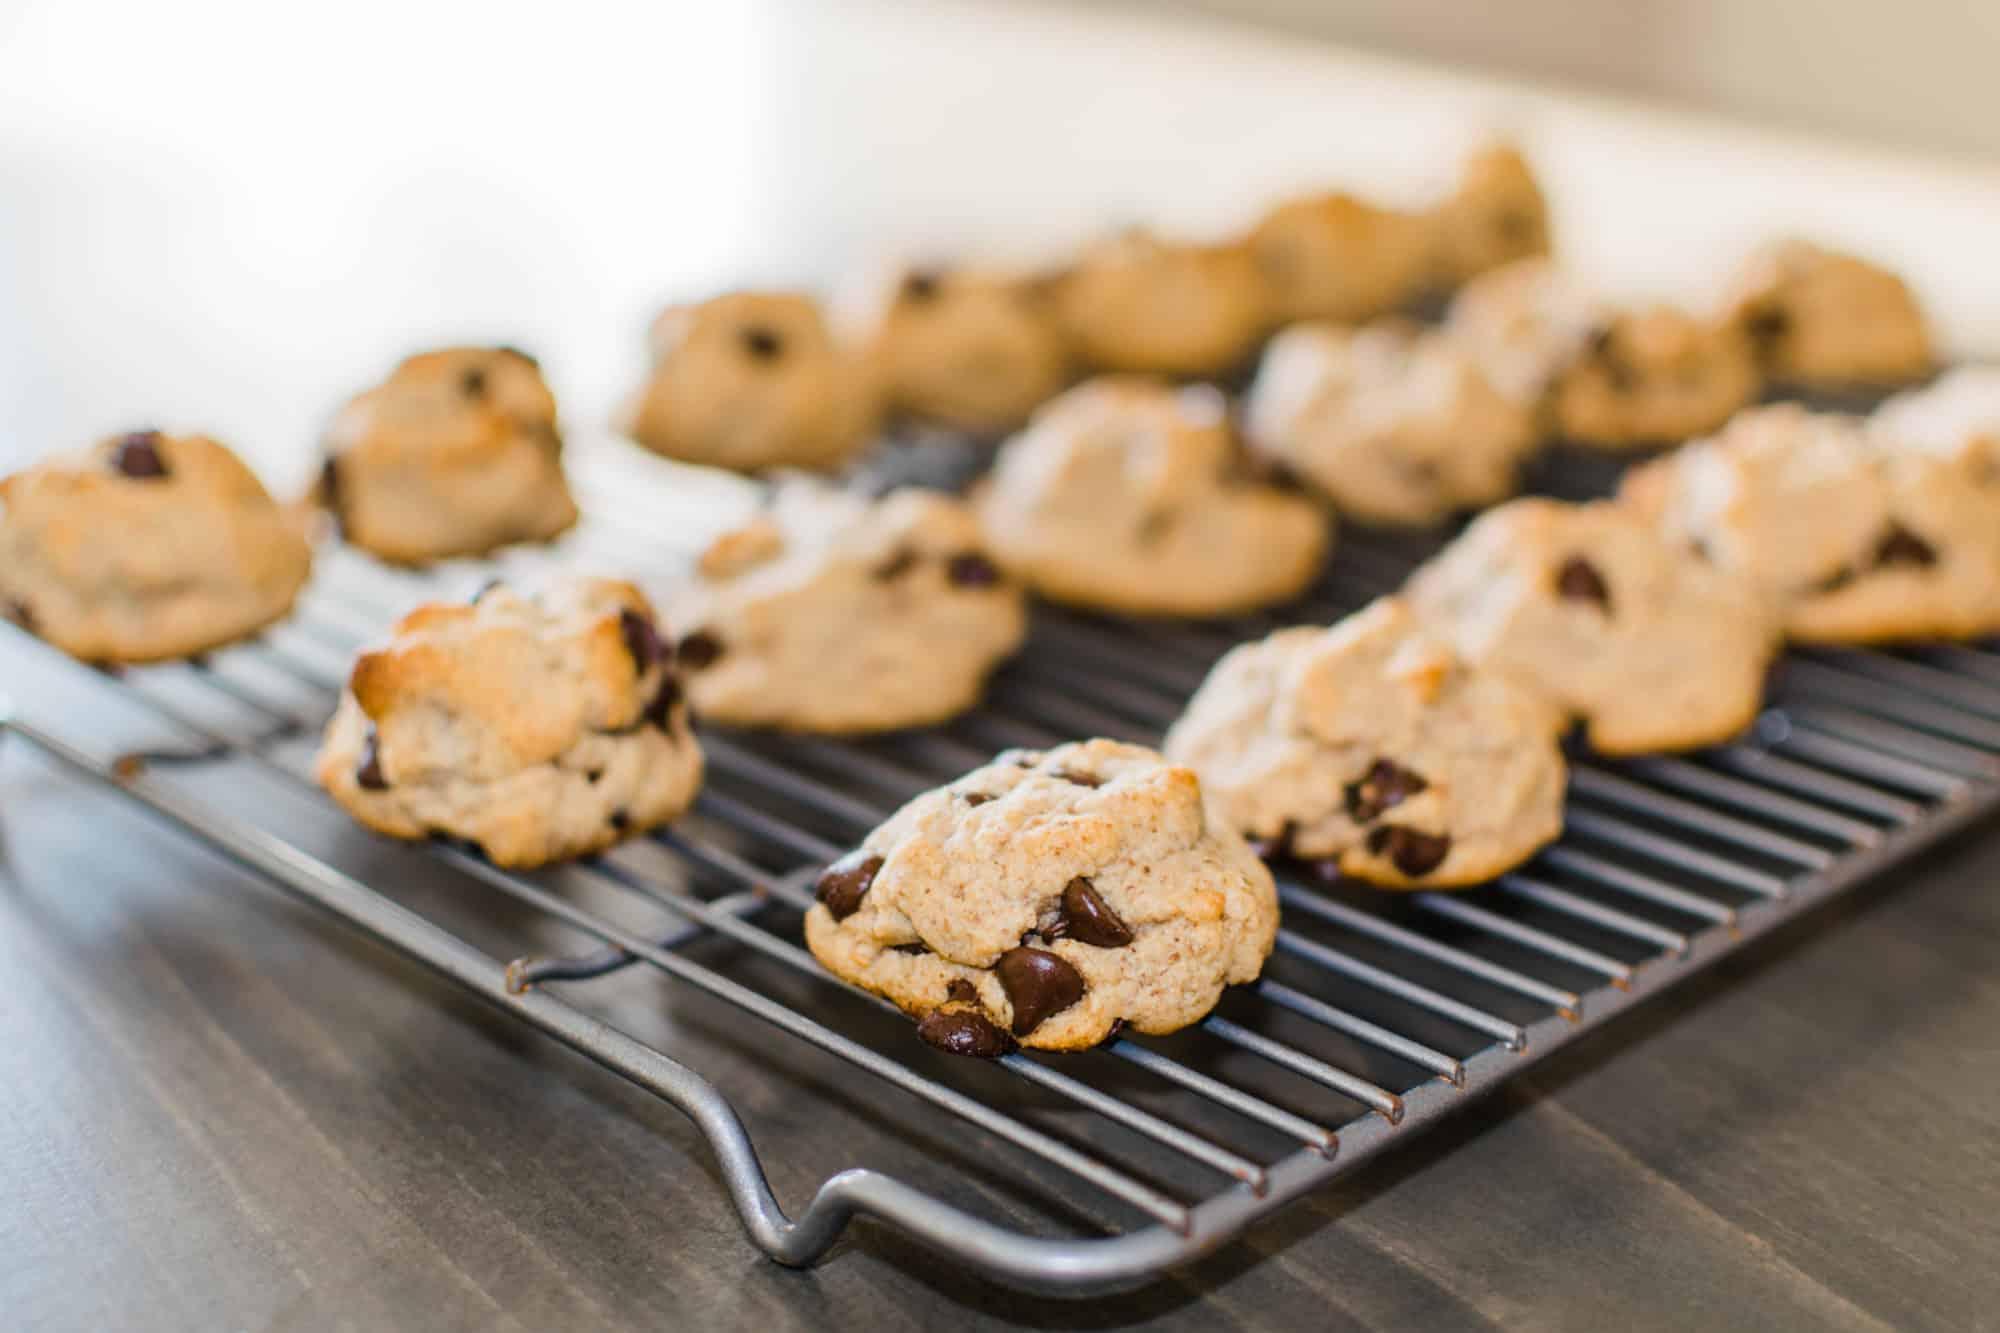 Frenchie Farm paleo chocolate chip cookies